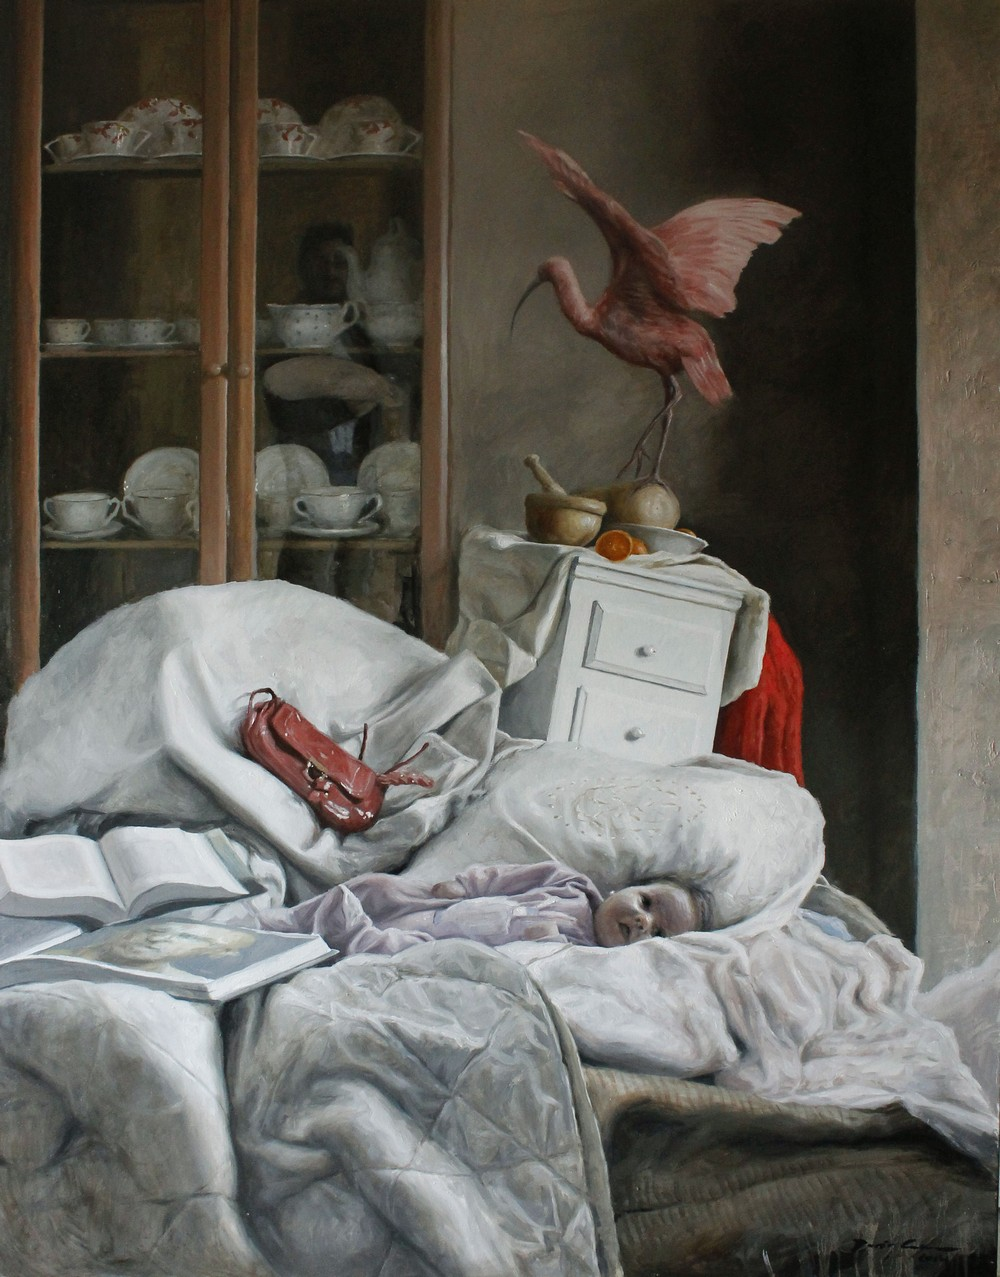 Неоднозначные работы Бориса Корреа